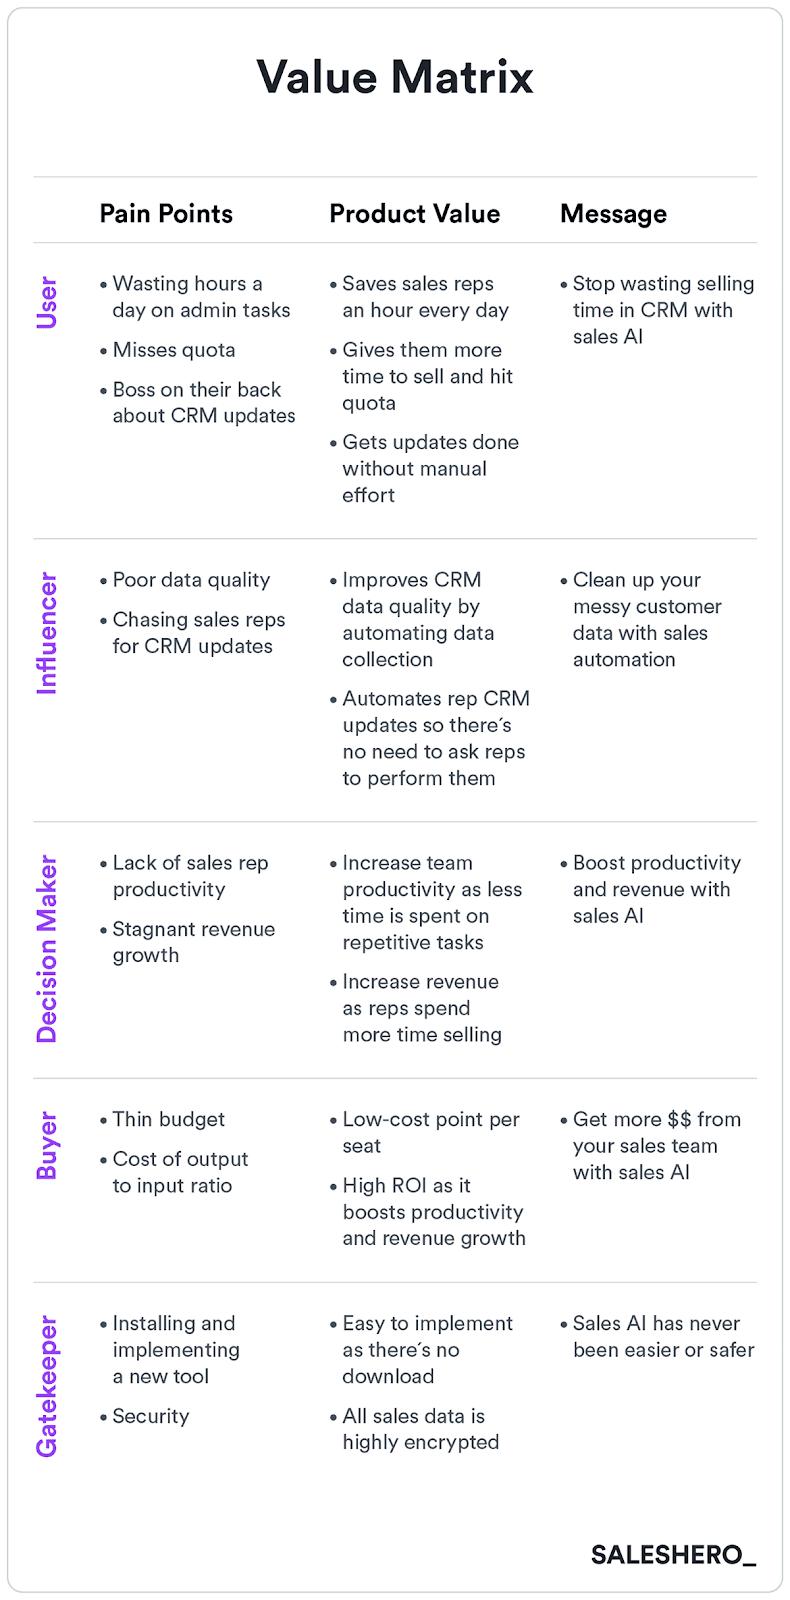 value matrix in a go to market plan